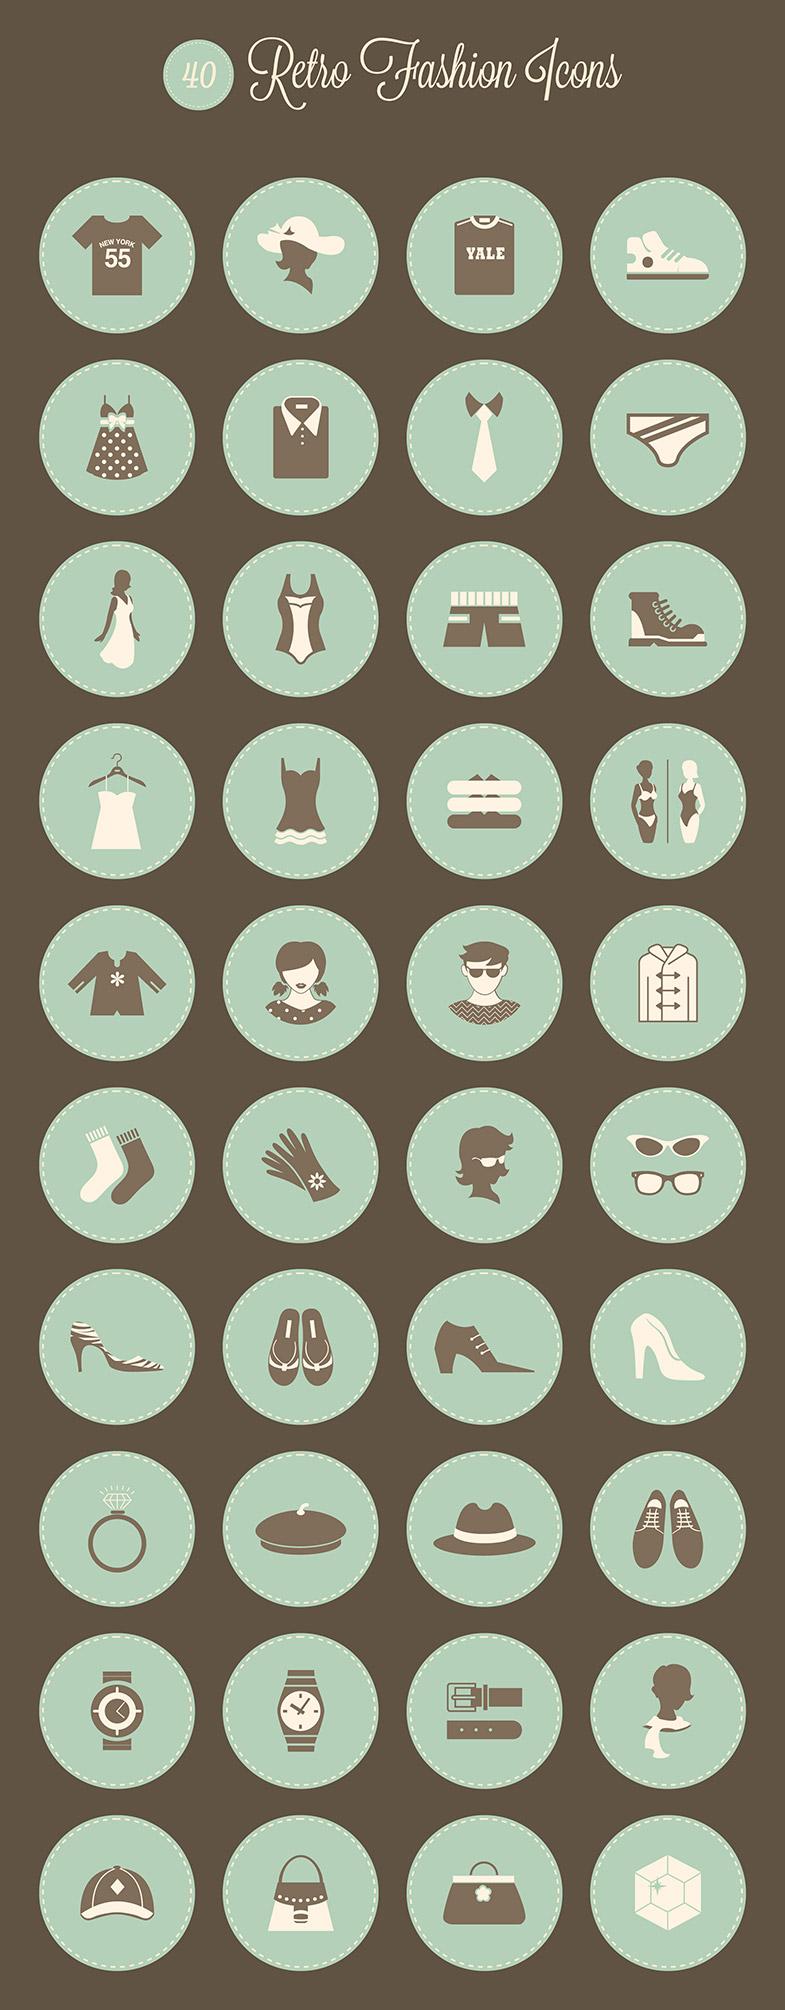 fashion icons free download